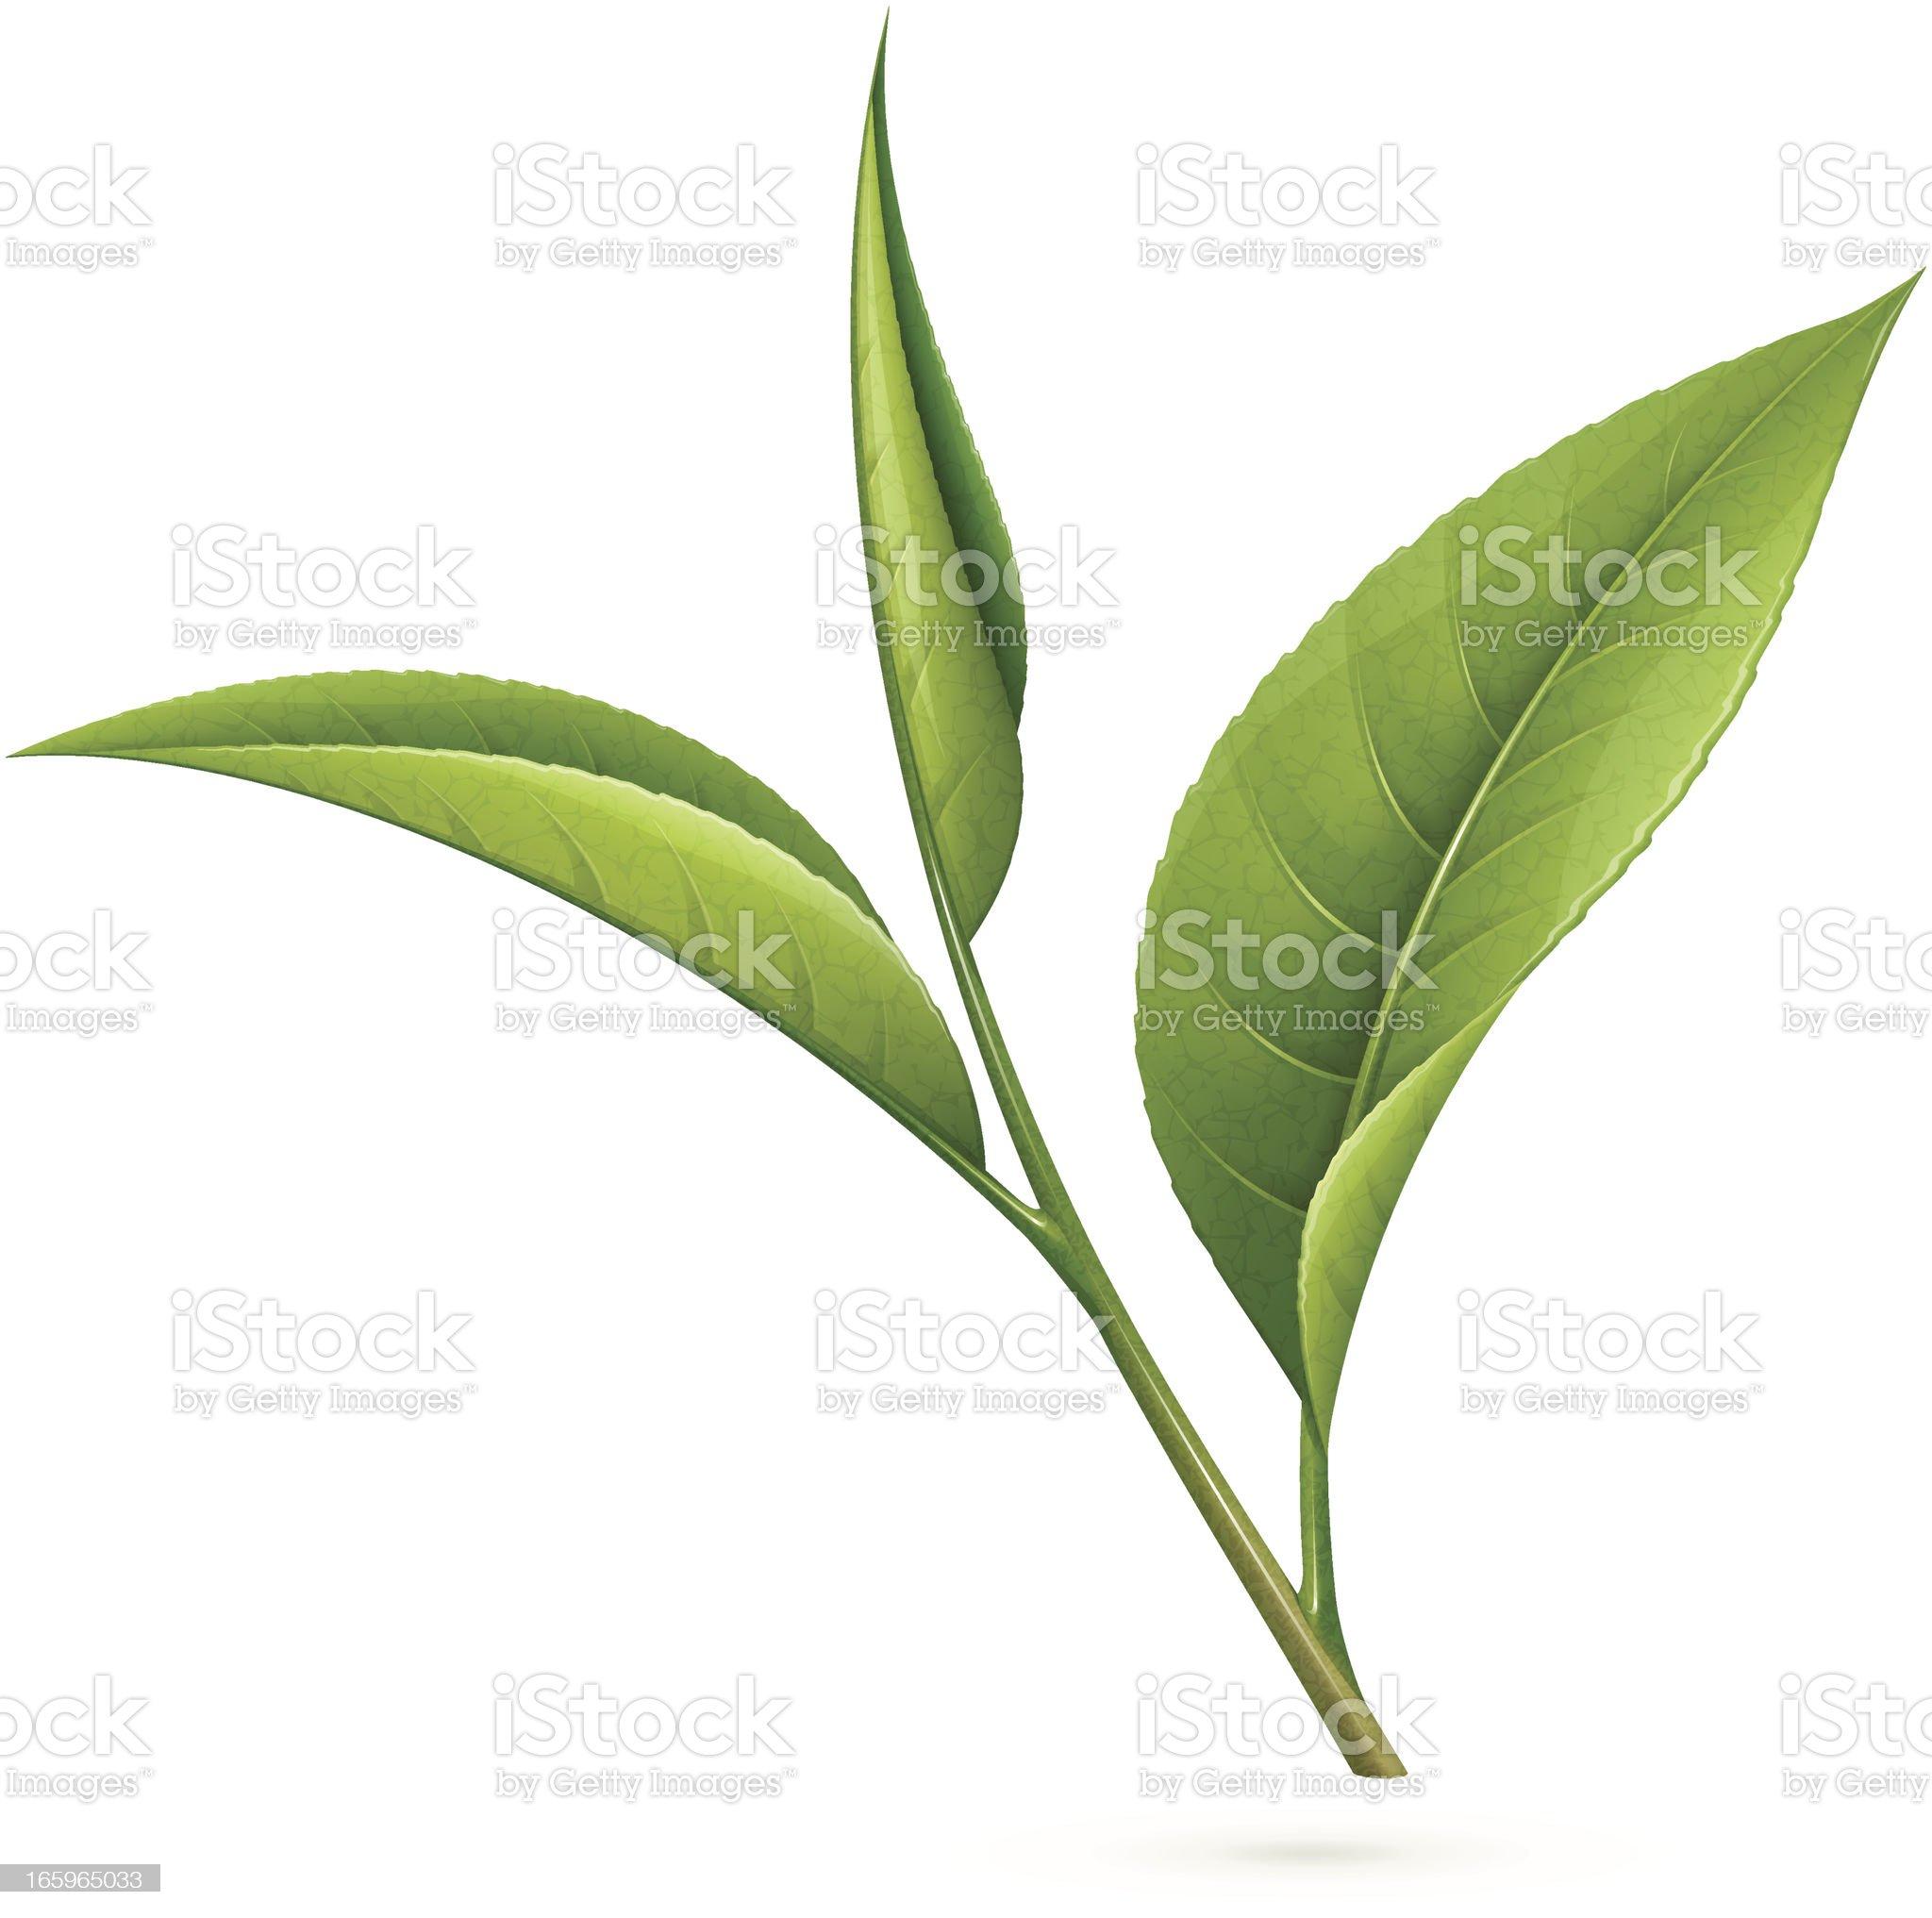 Tea leaves royalty-free stock vector art